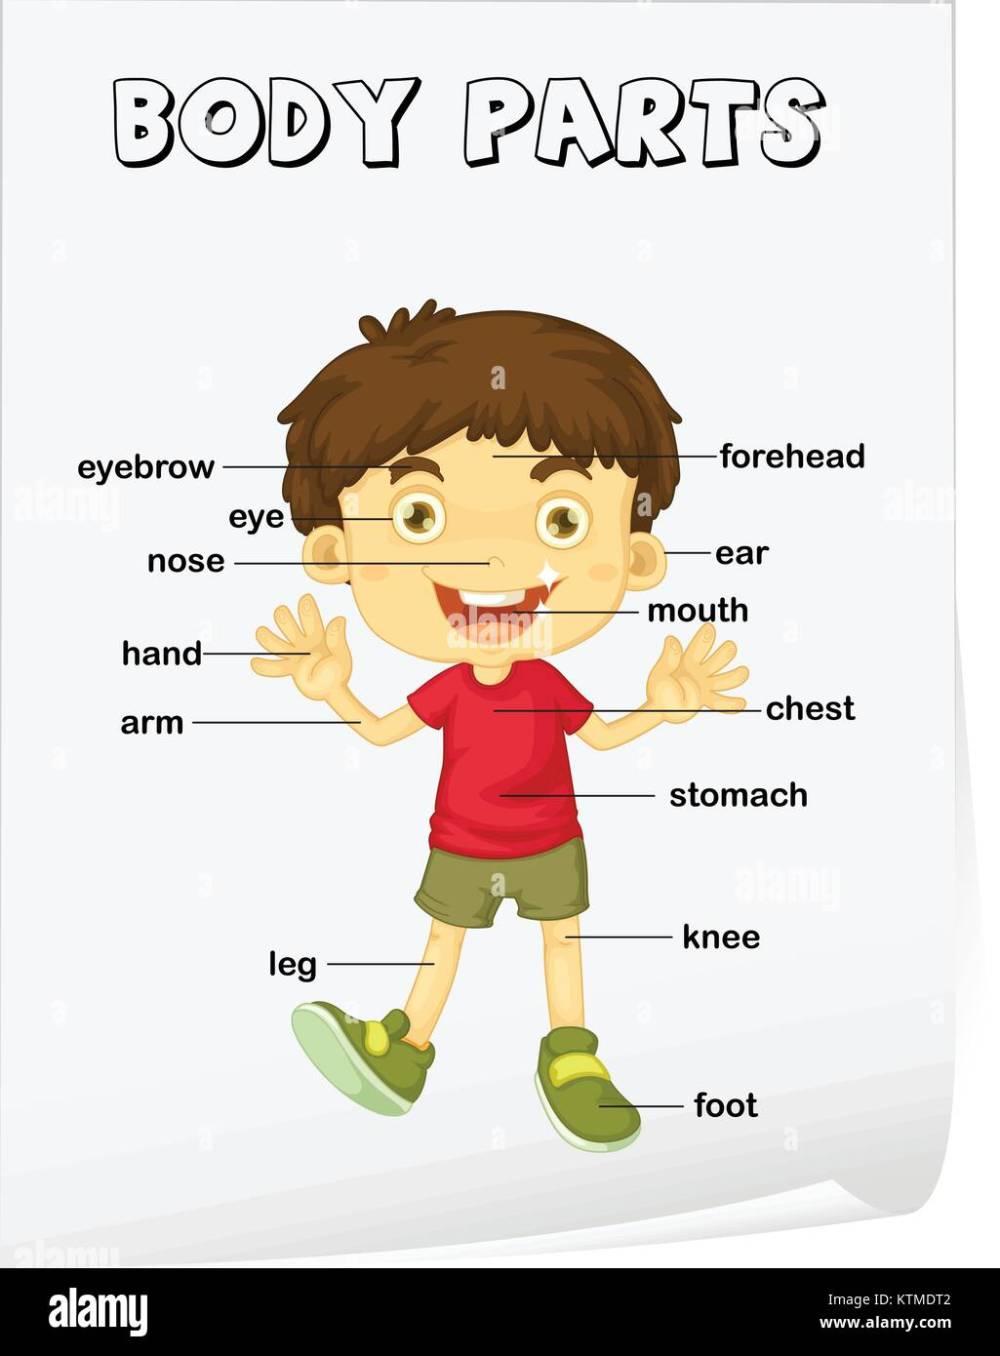 medium resolution of Vocabulary worksheet - parts of the body Stock Vector Image \u0026 Art - Alamy